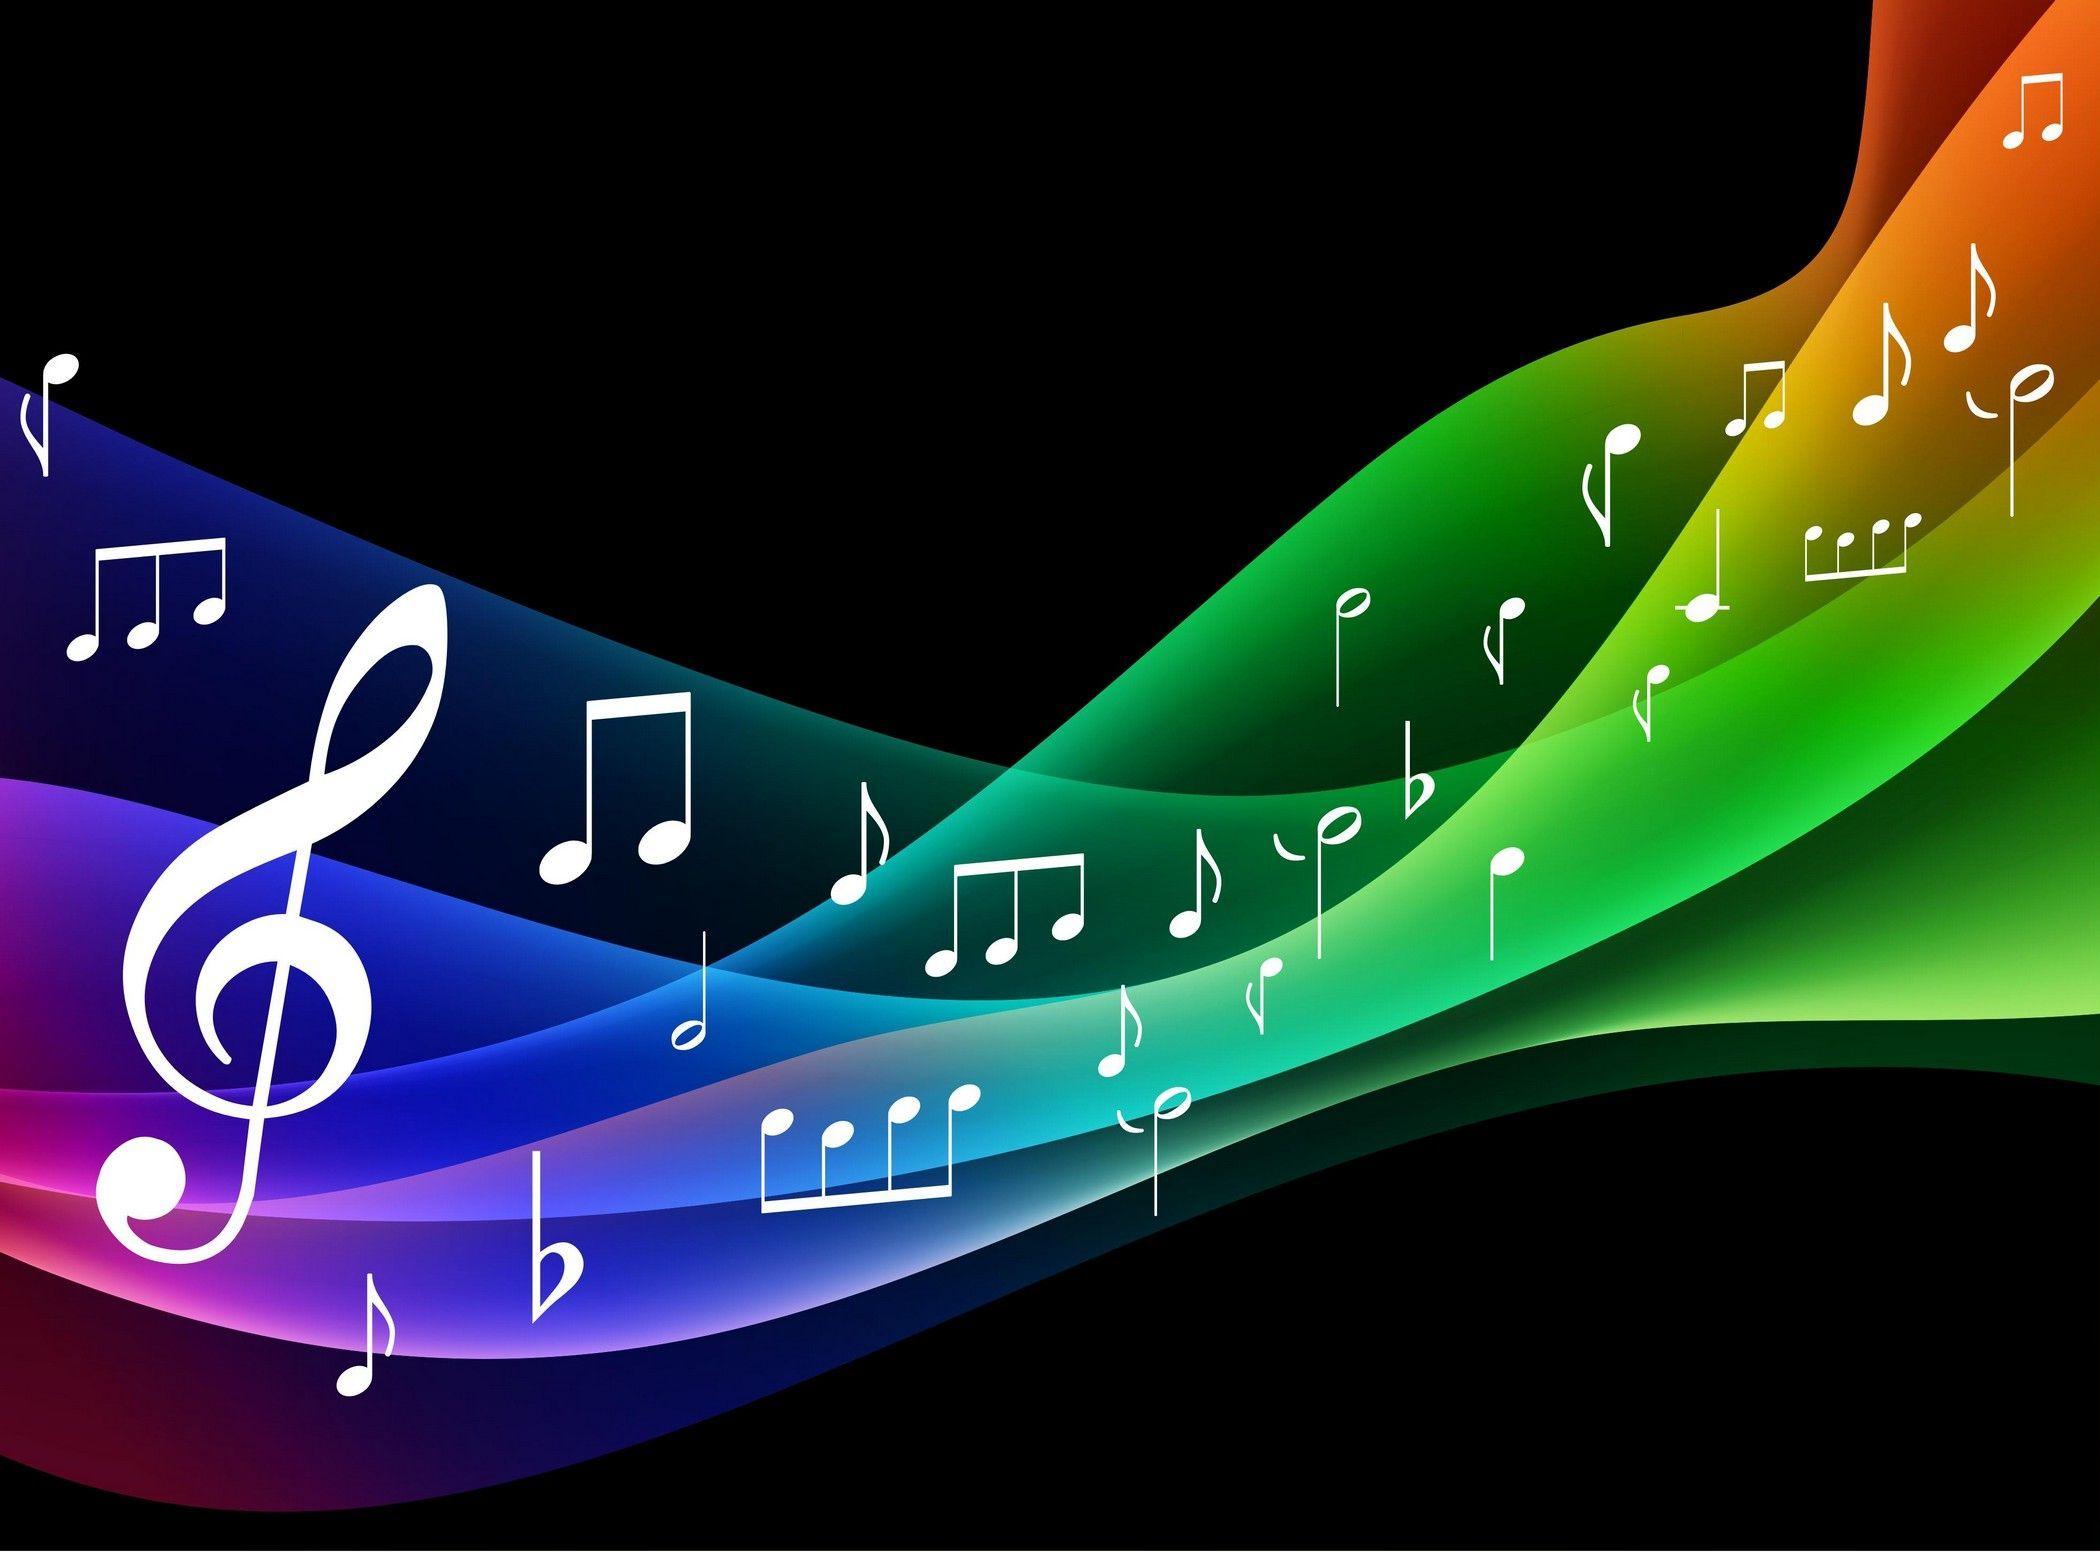 Colorful Musical Notes Hd Desktop Wallpaper Widescreen High Seni